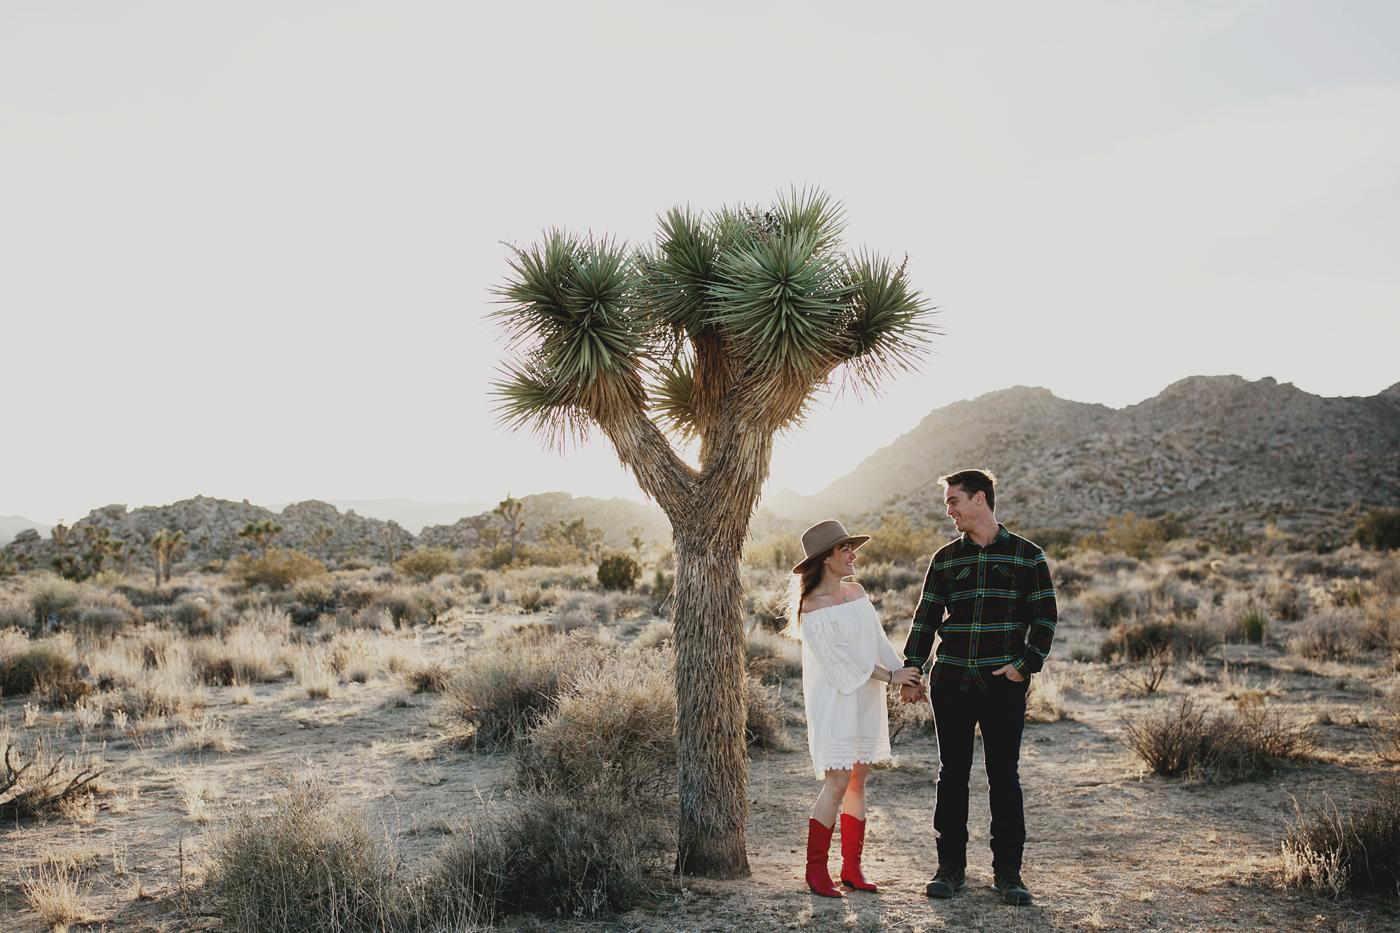 joshua_tree_engagement_006